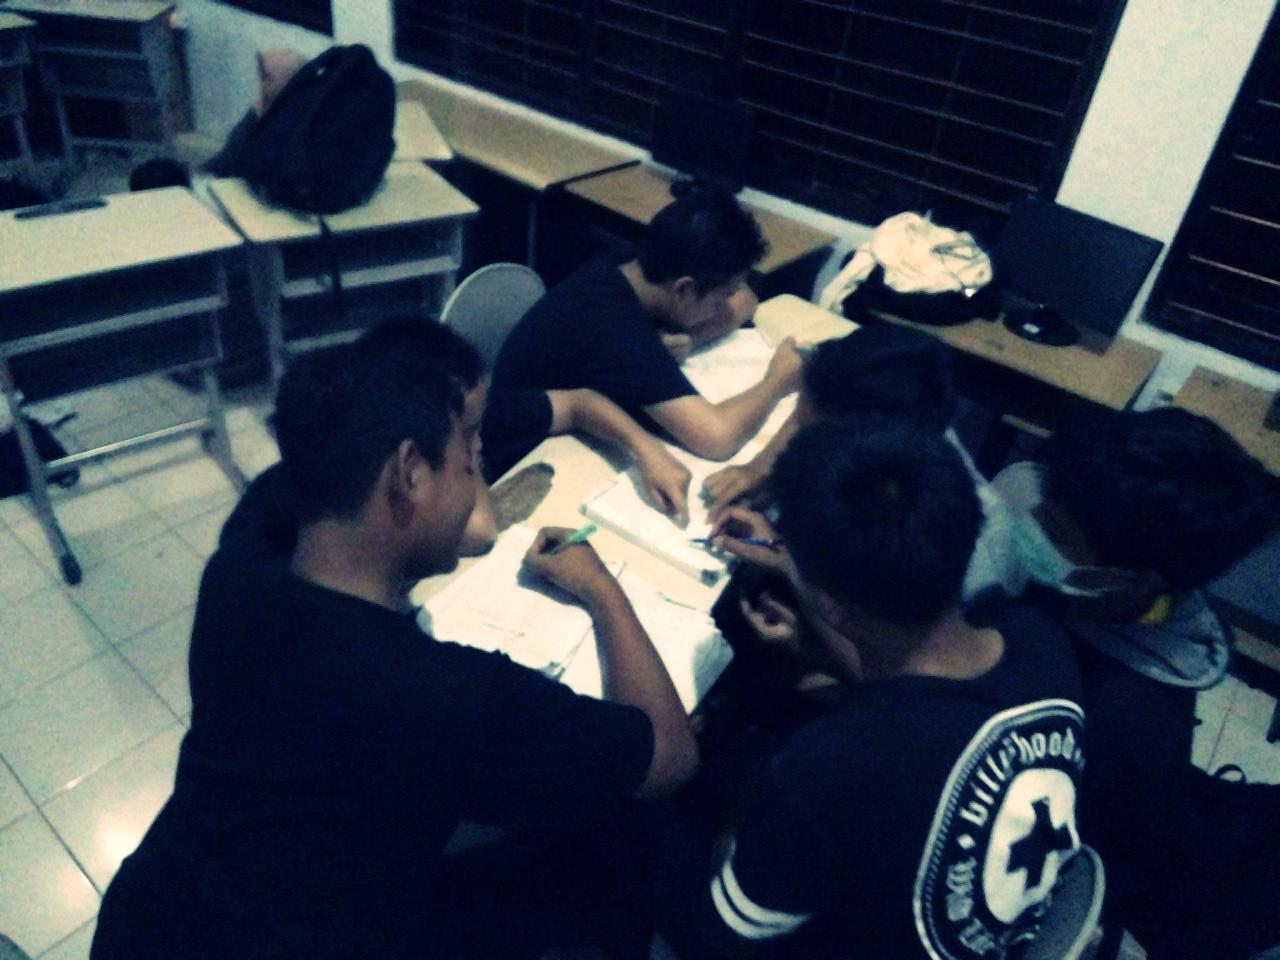 Bimbingan guru siswa sampai H-1 (5)